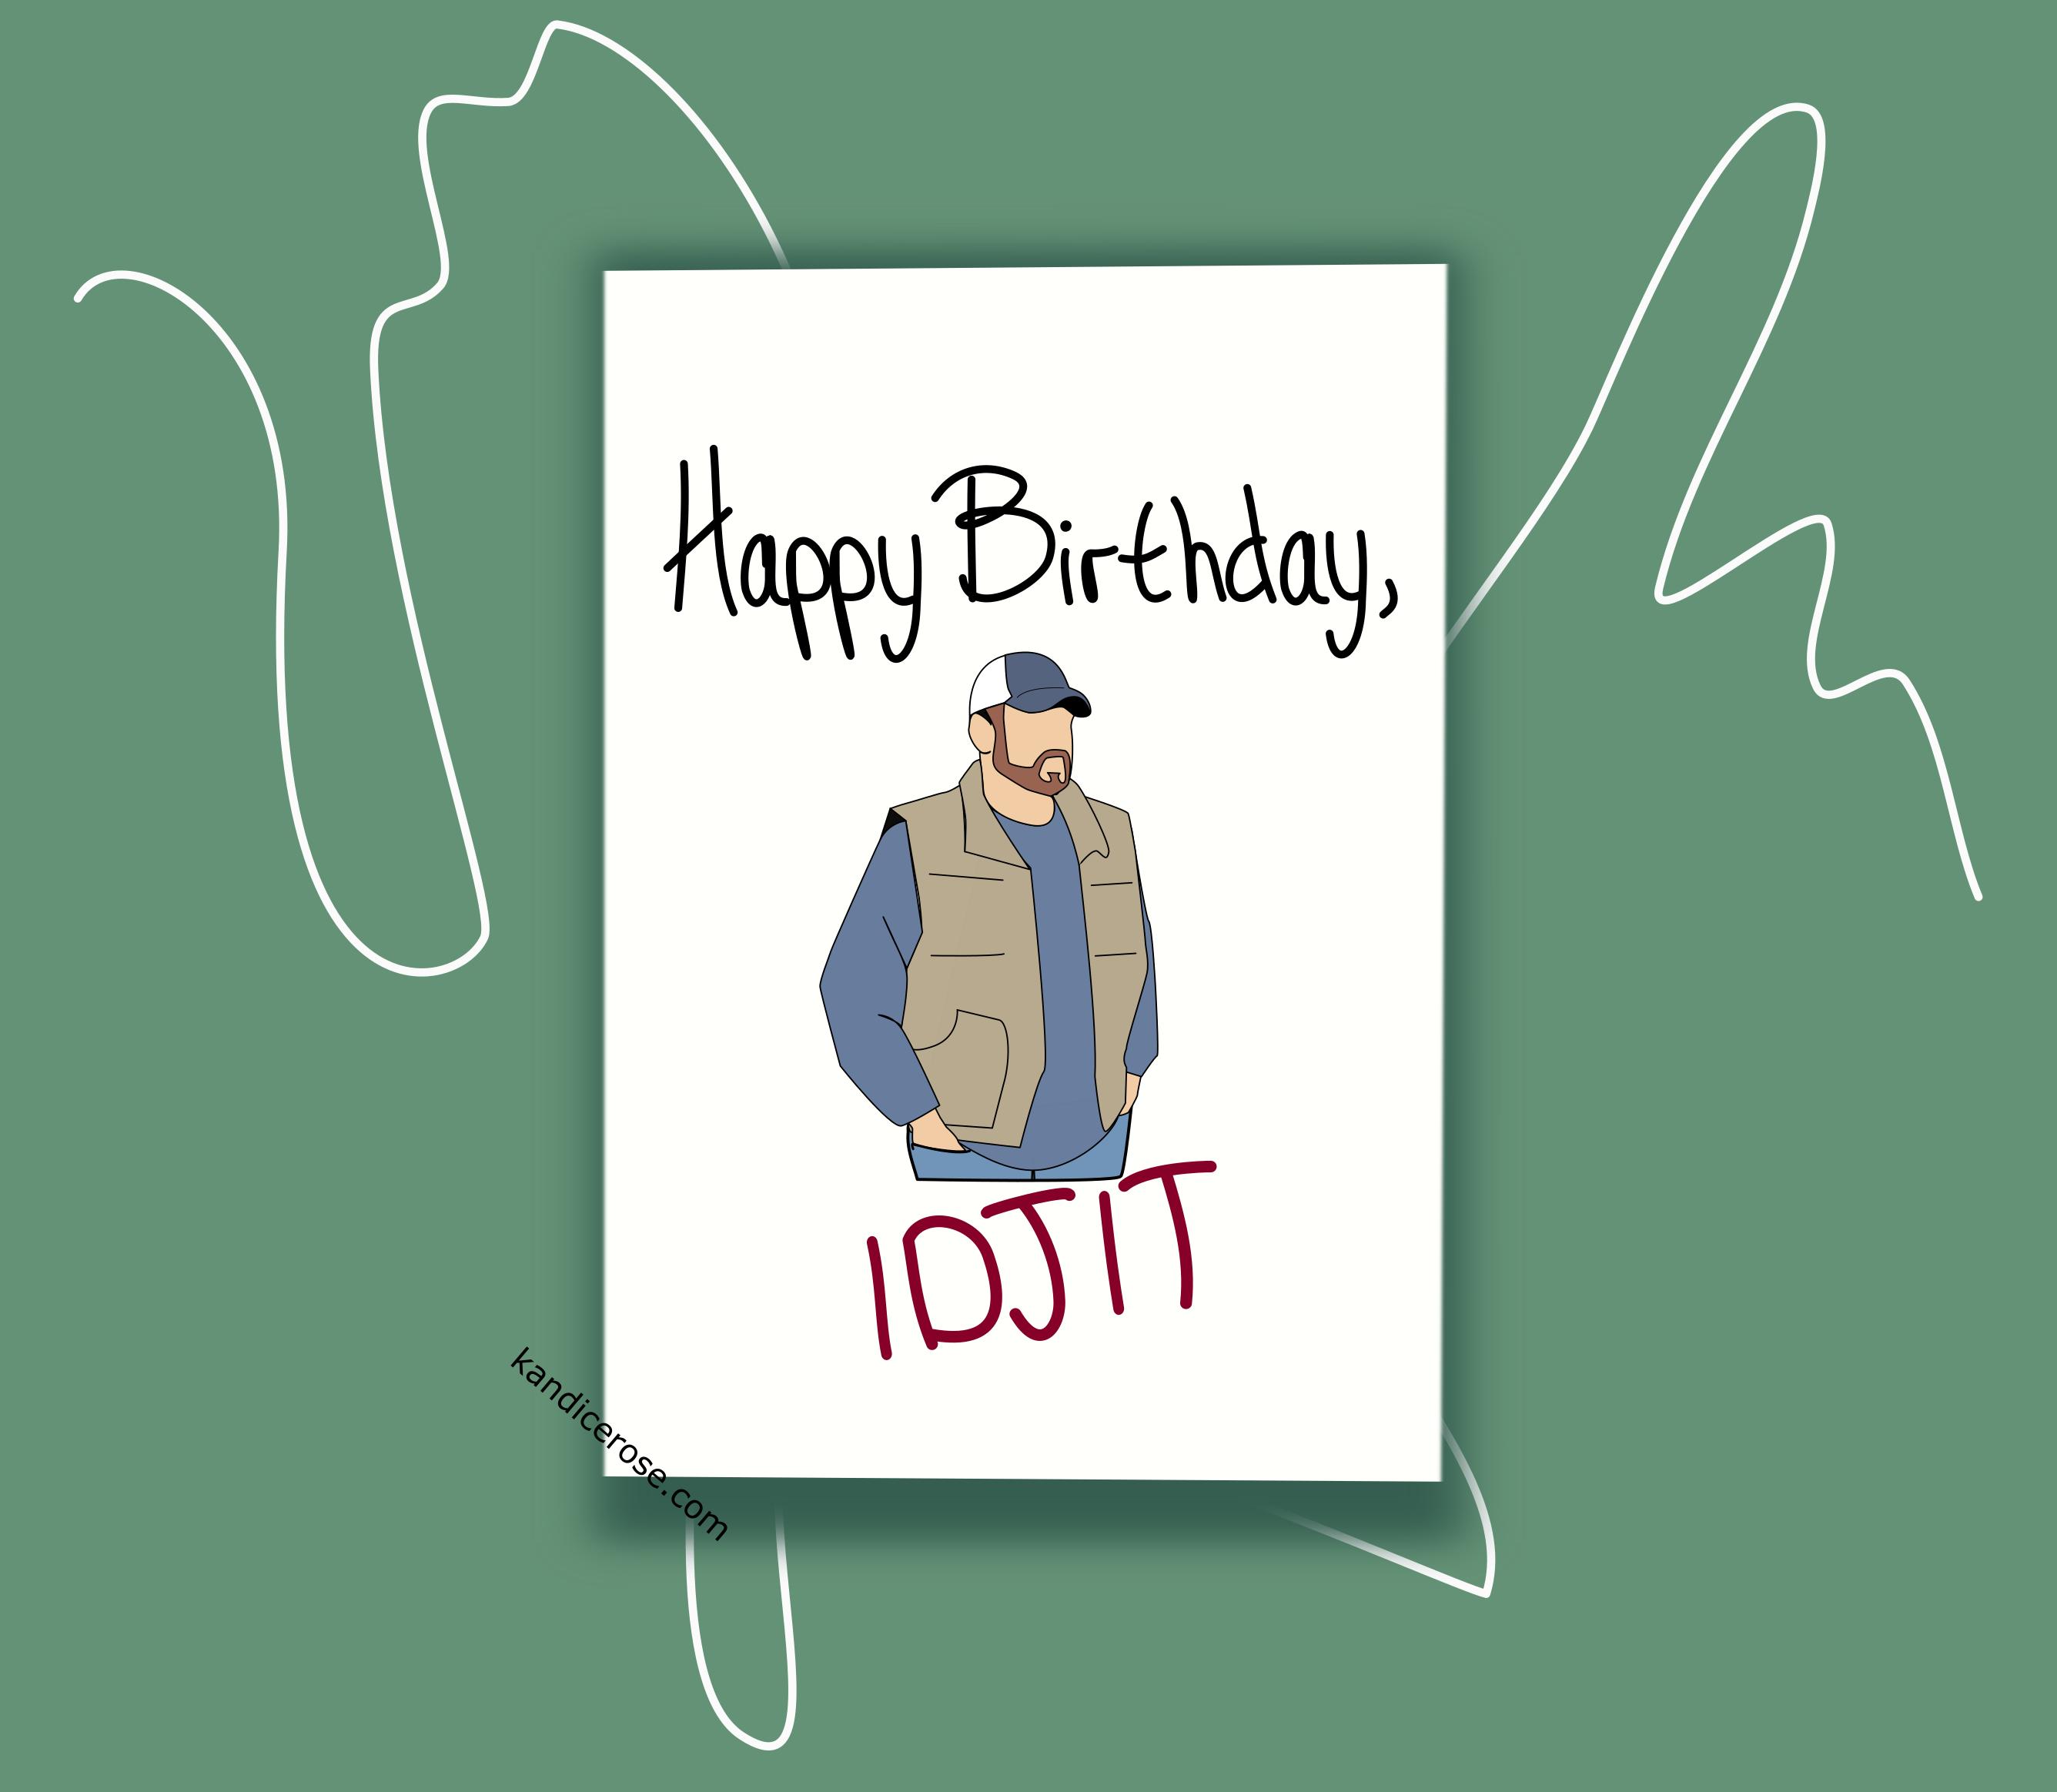 Bobby Singer Supernatural Birthday Card Supernatural Birthday Birthday Cards Bobby Singer Supernatural